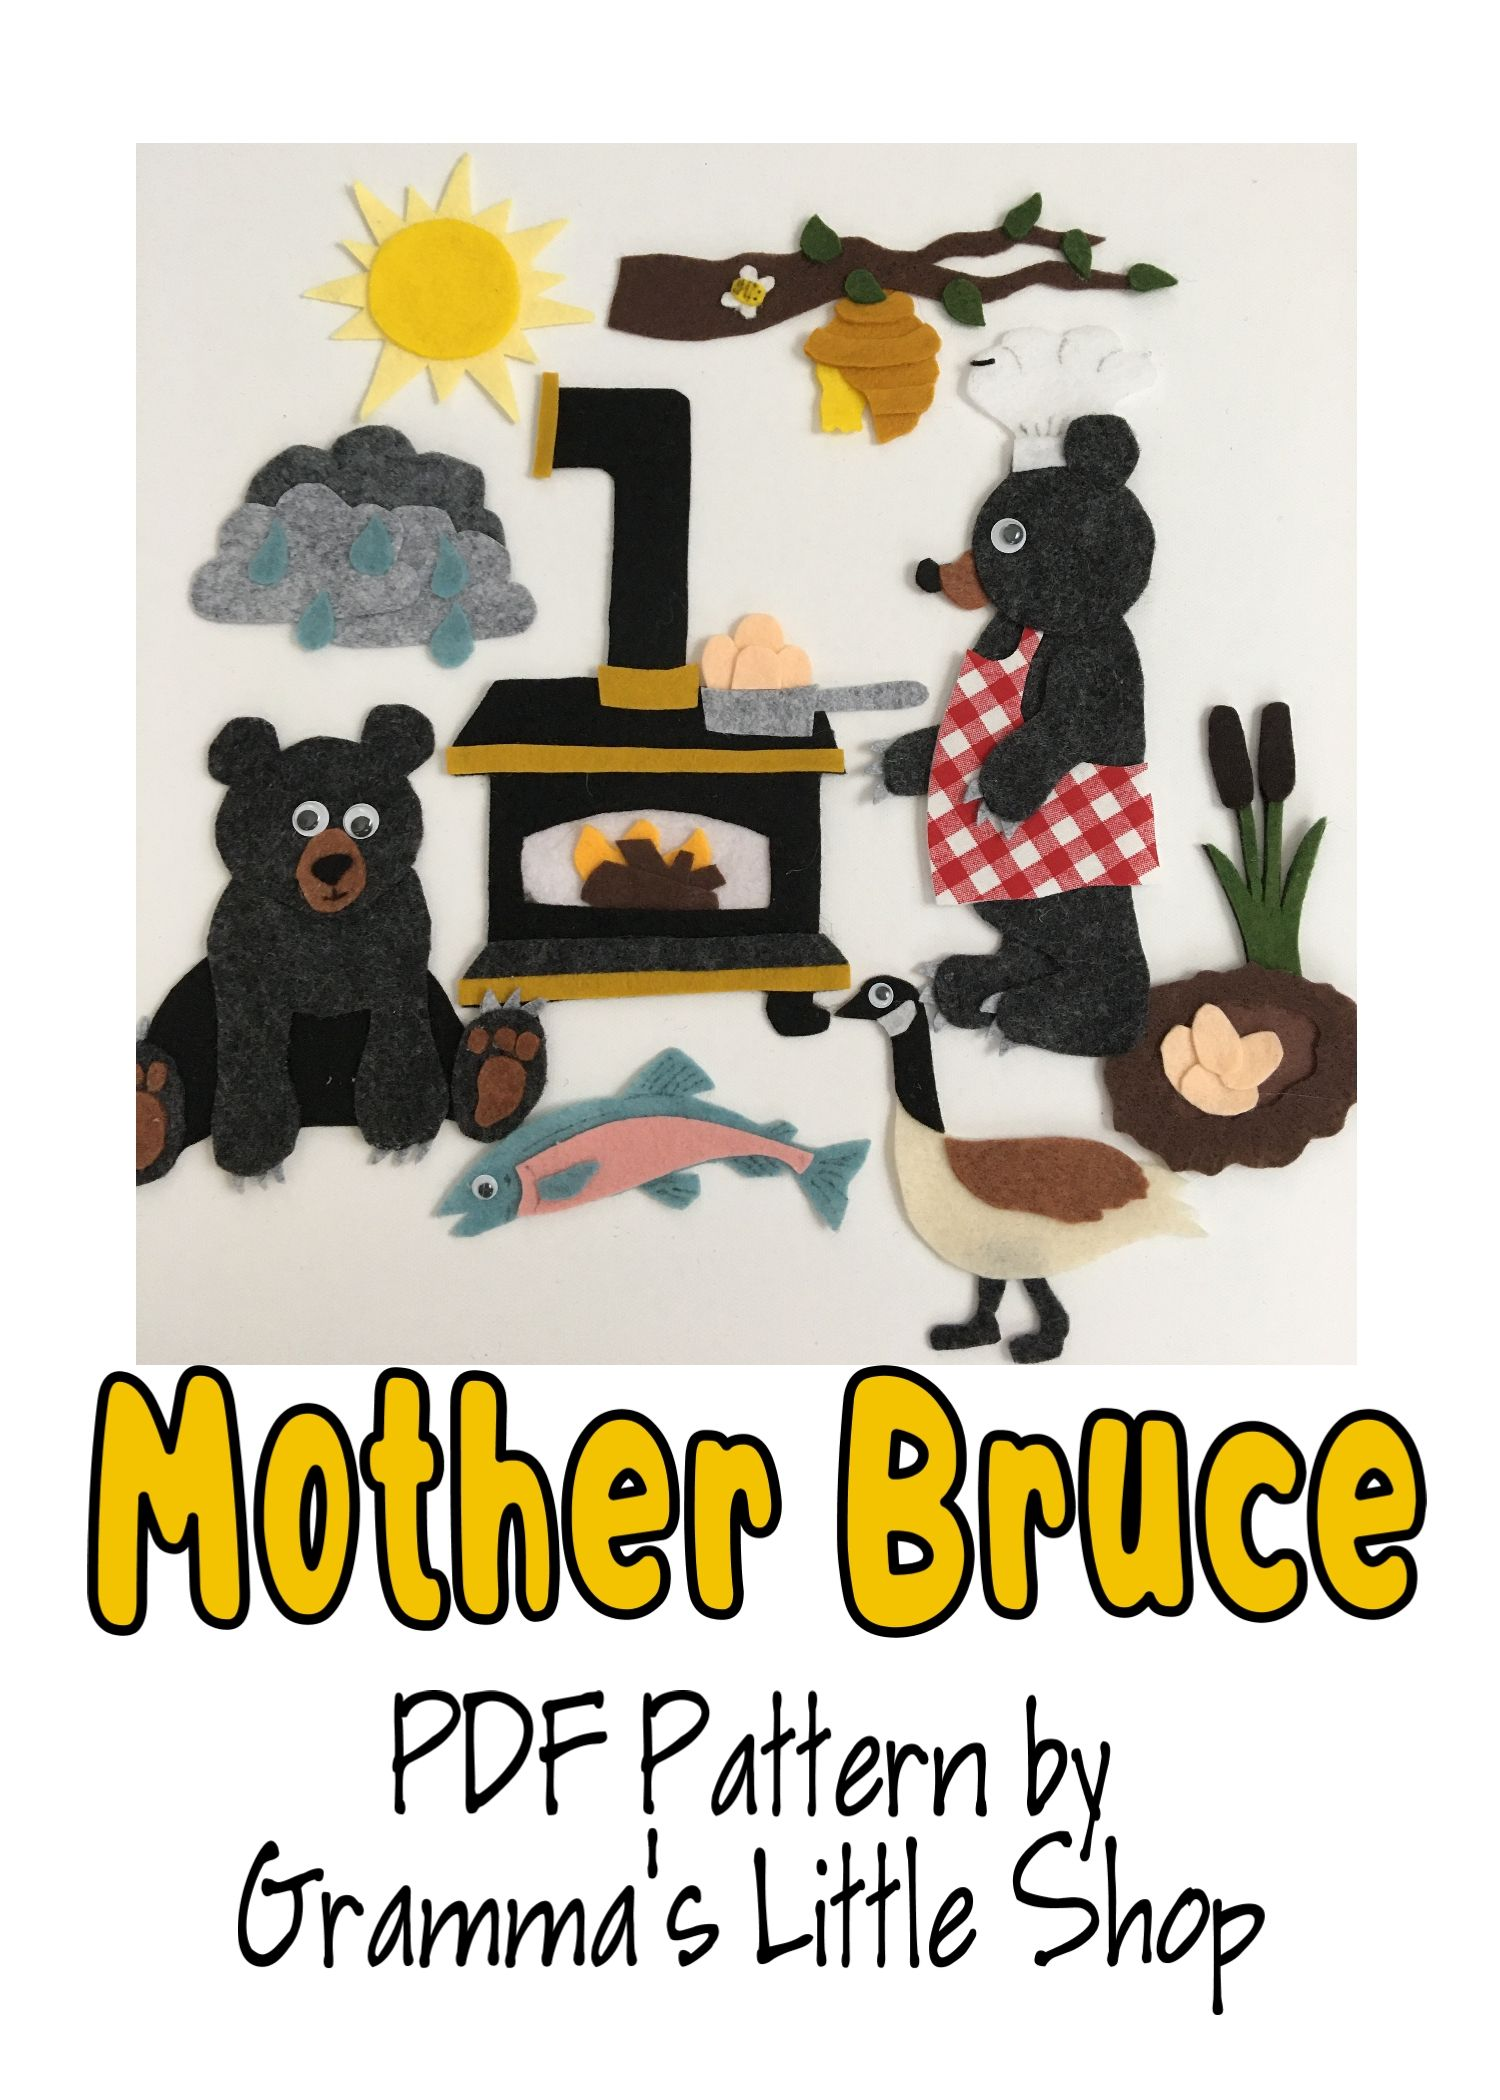 Mother Bruce Felt Pattern In 2020 How To Draw Hands Felt Stories Felt